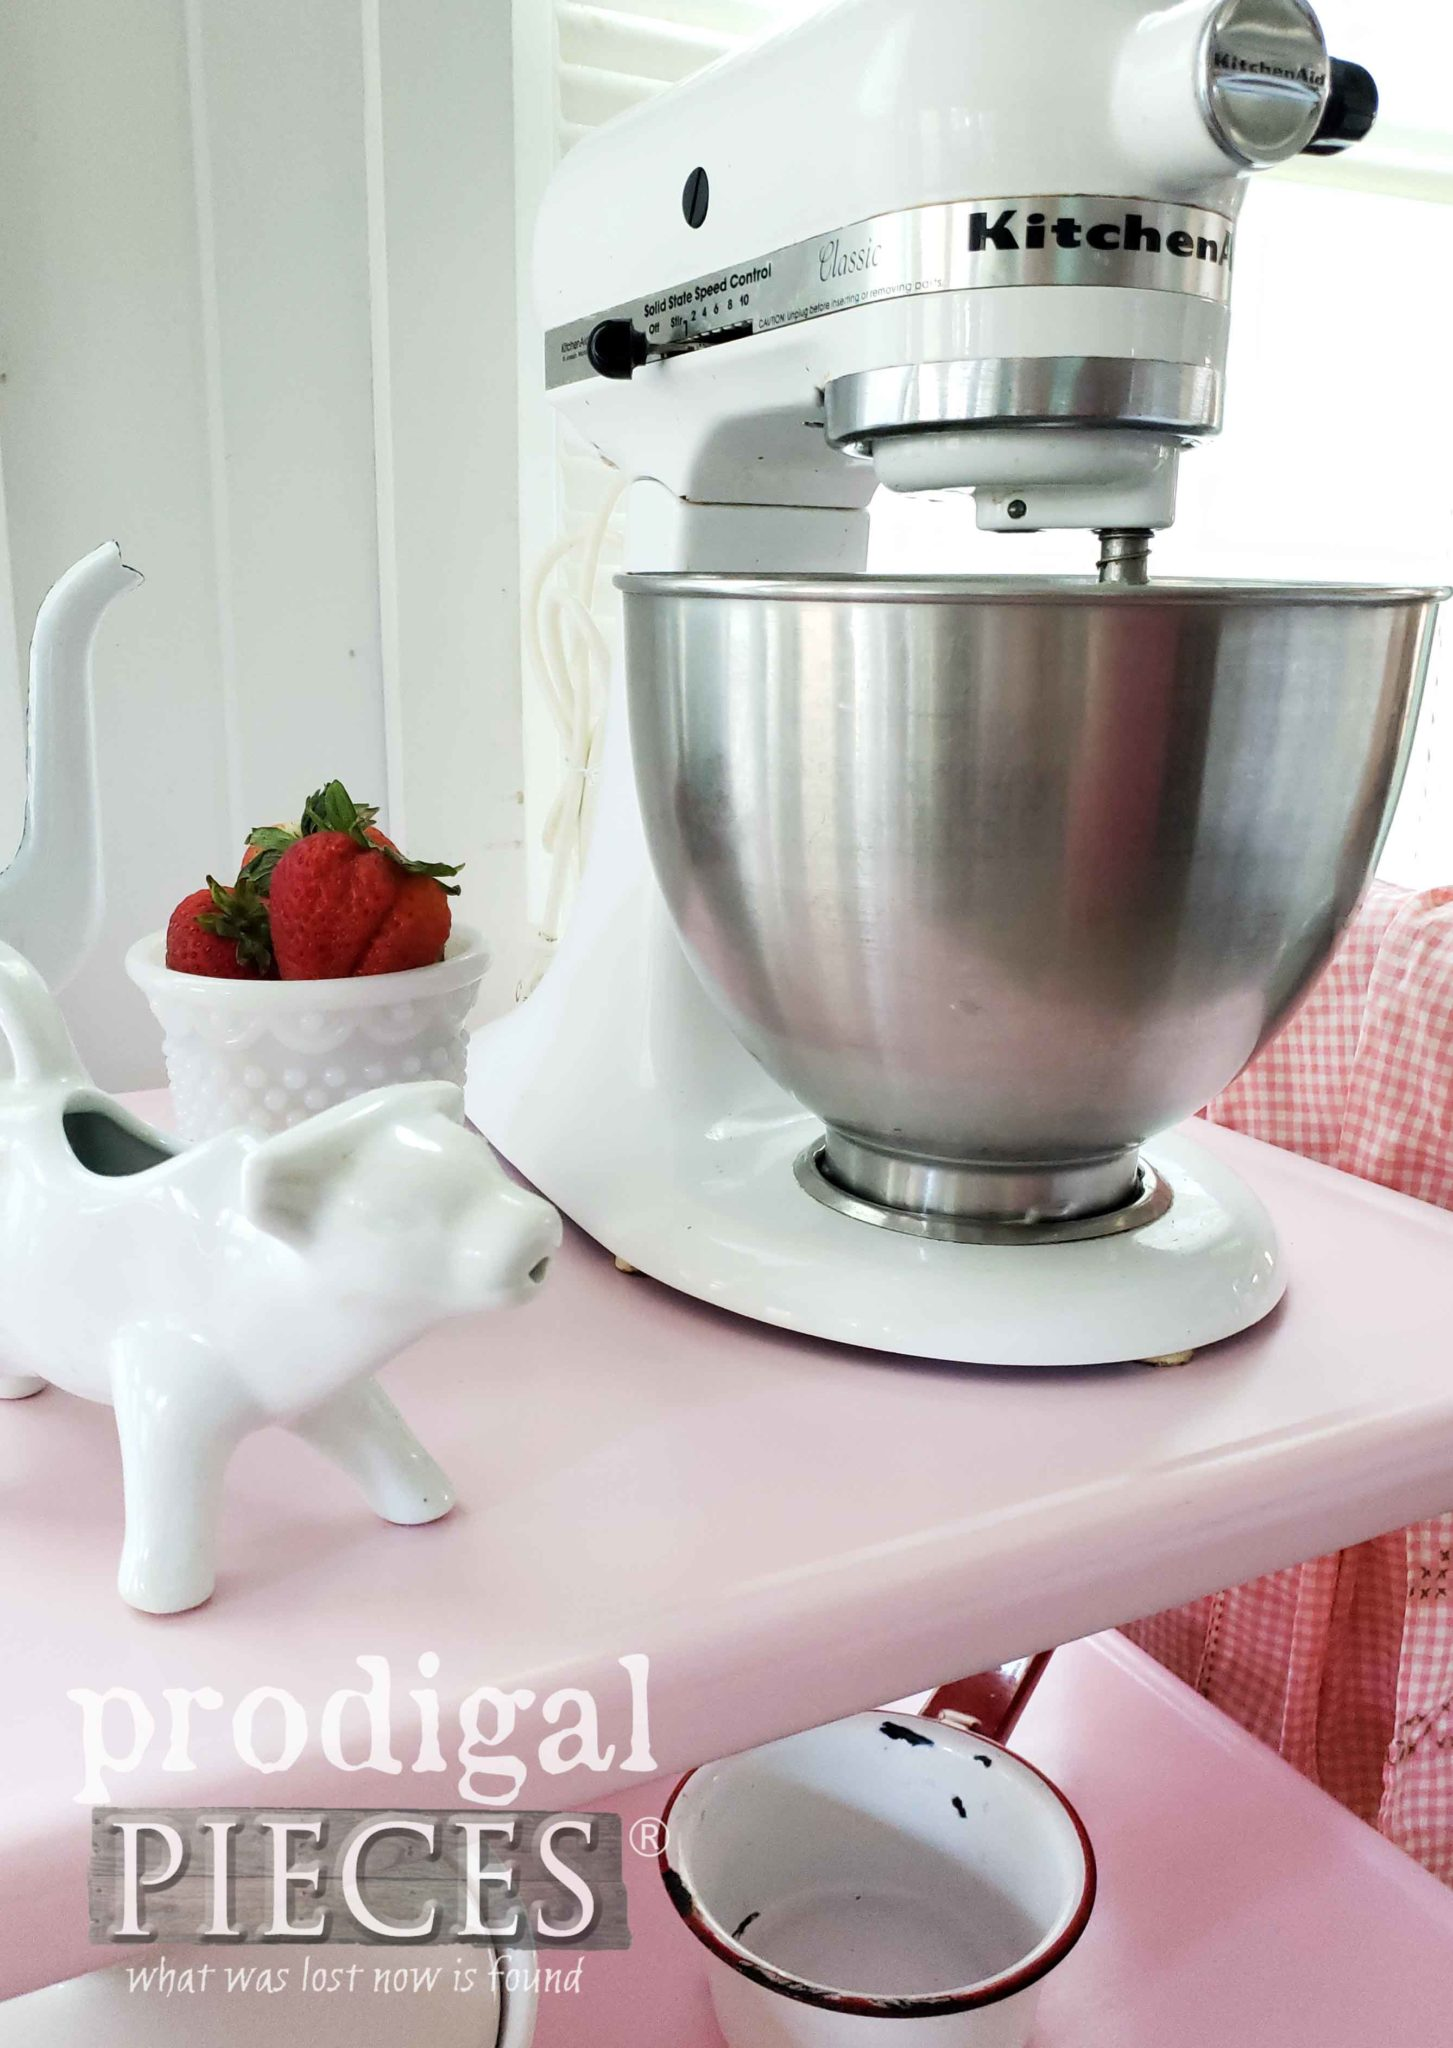 Vintage Kitchenaid Stand Mixer on Vintage Cosco Cart | prodigalpieces.com #prodigalpieces #vintage #kitchenaid